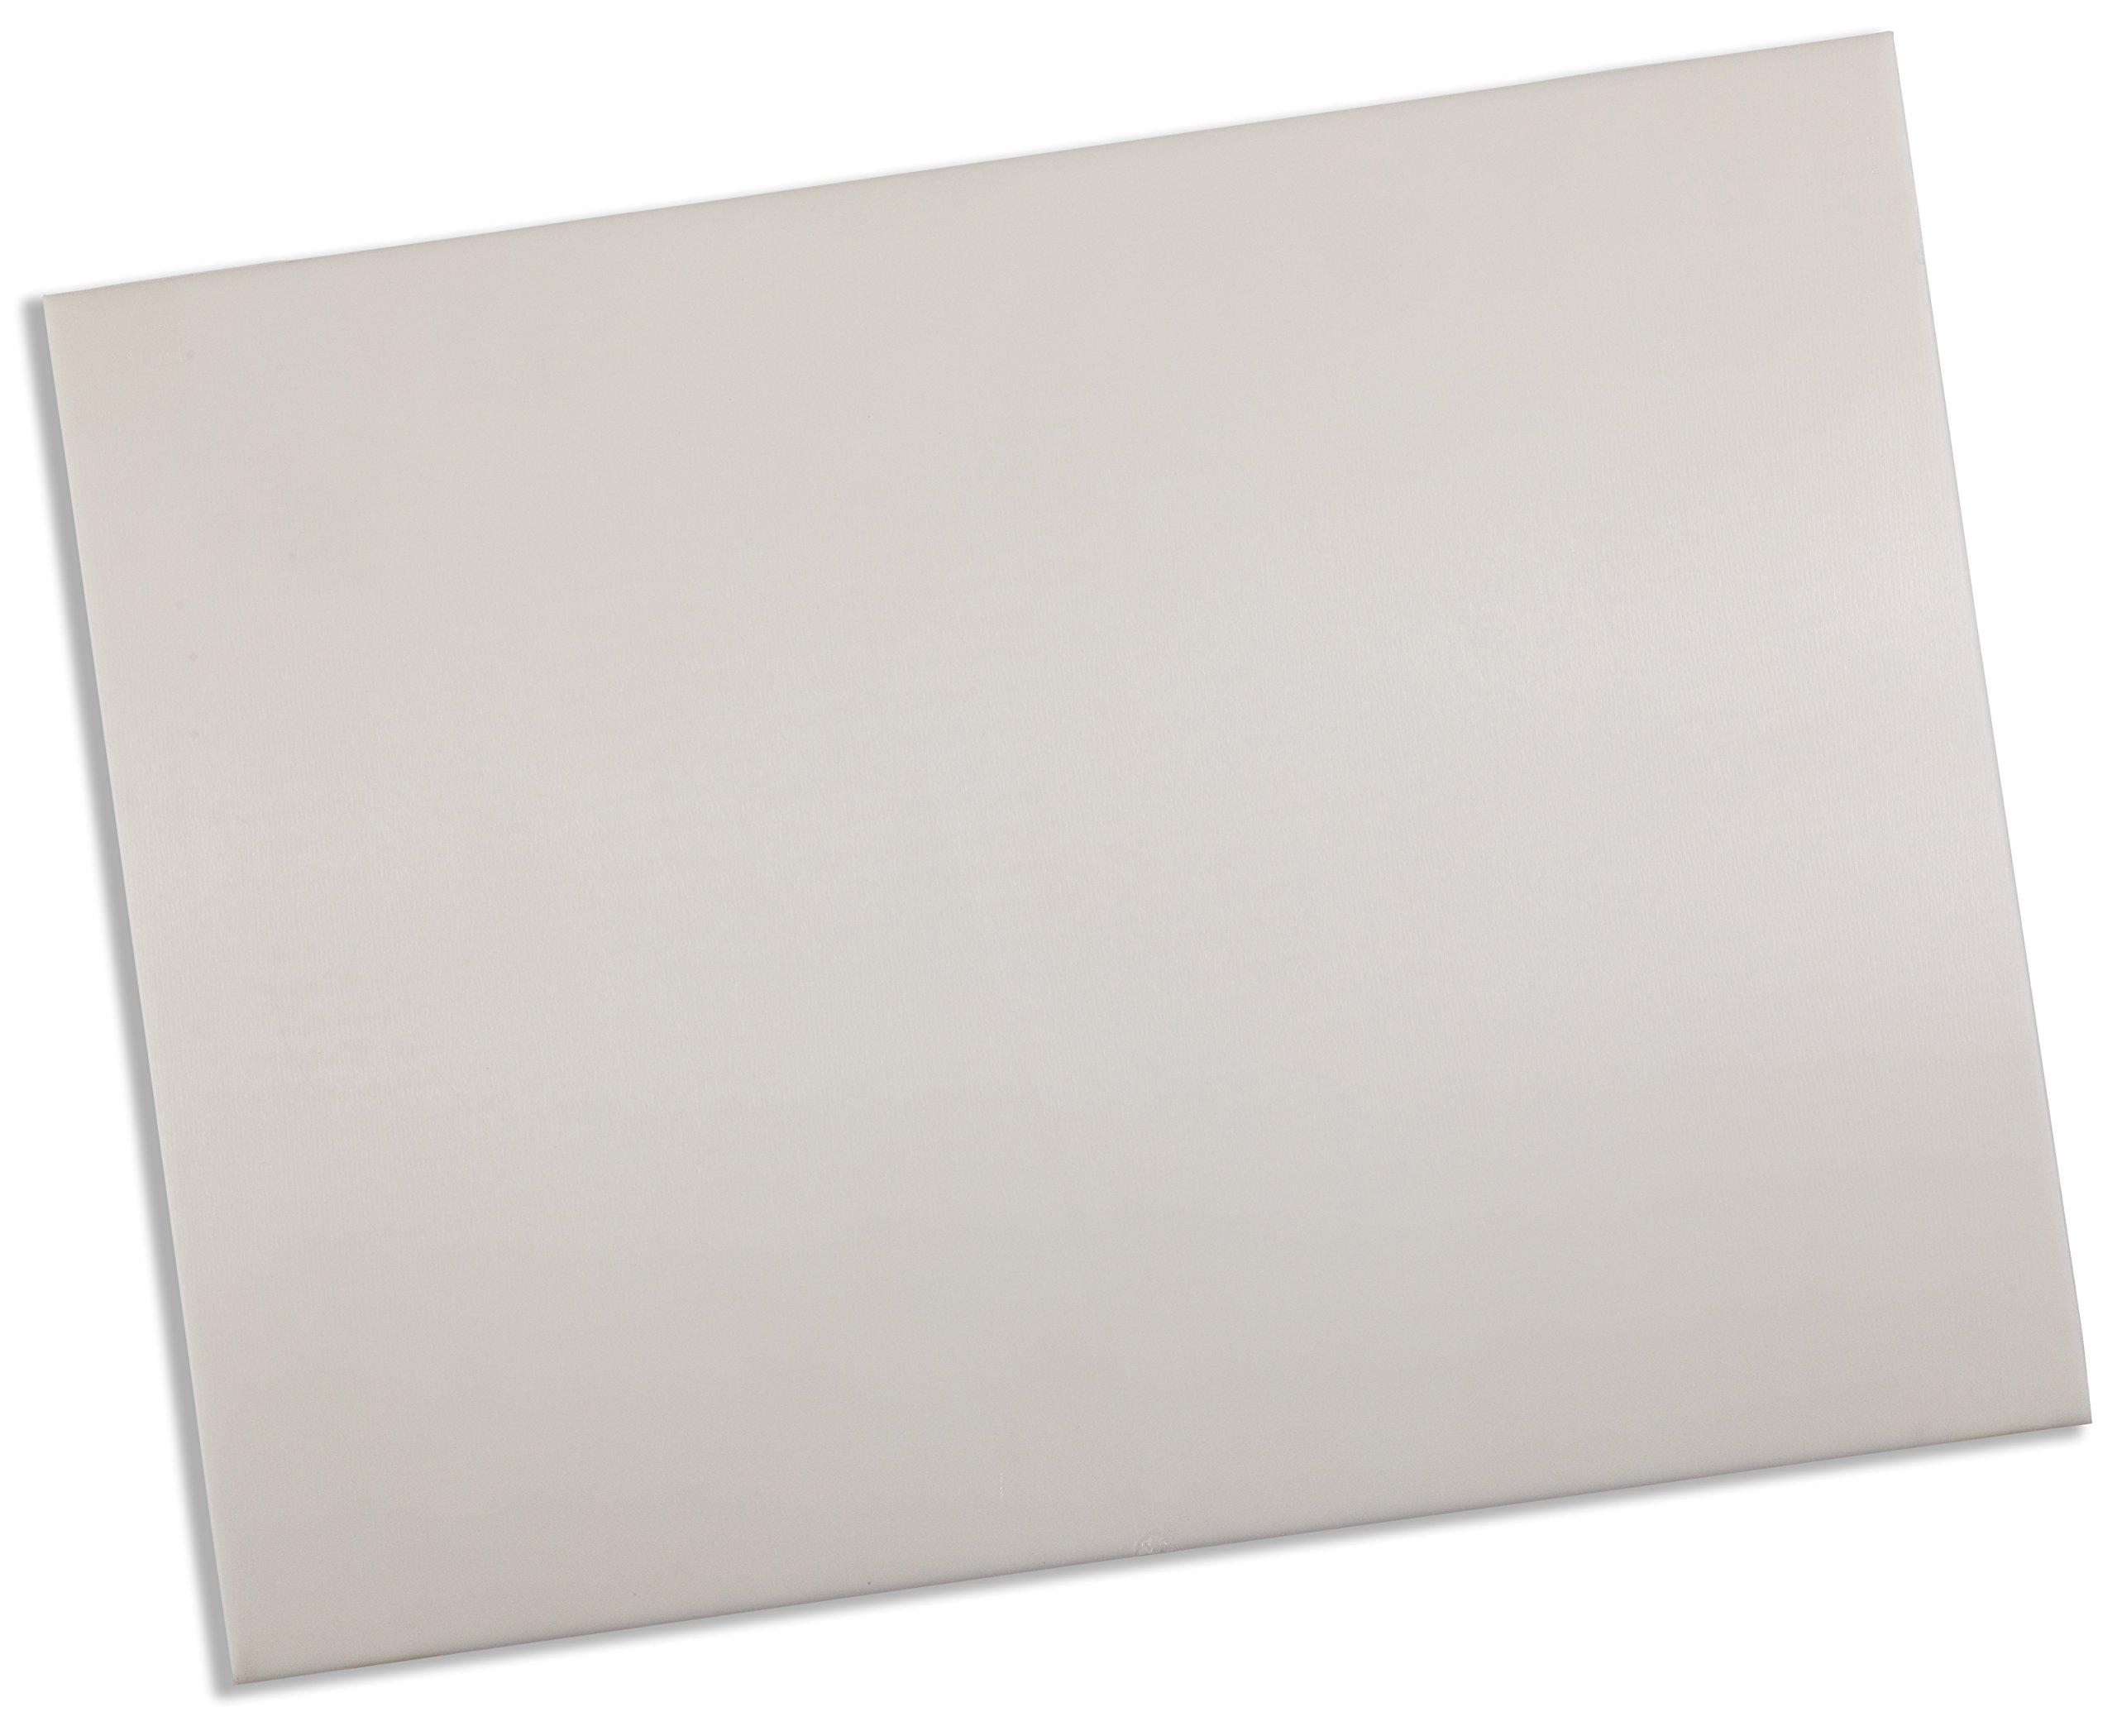 Rolyan Splinting Material Sheet, Aquaplast-T ProDrape, White, 1/8''x 9'' x12'', Solid, Single Sheet